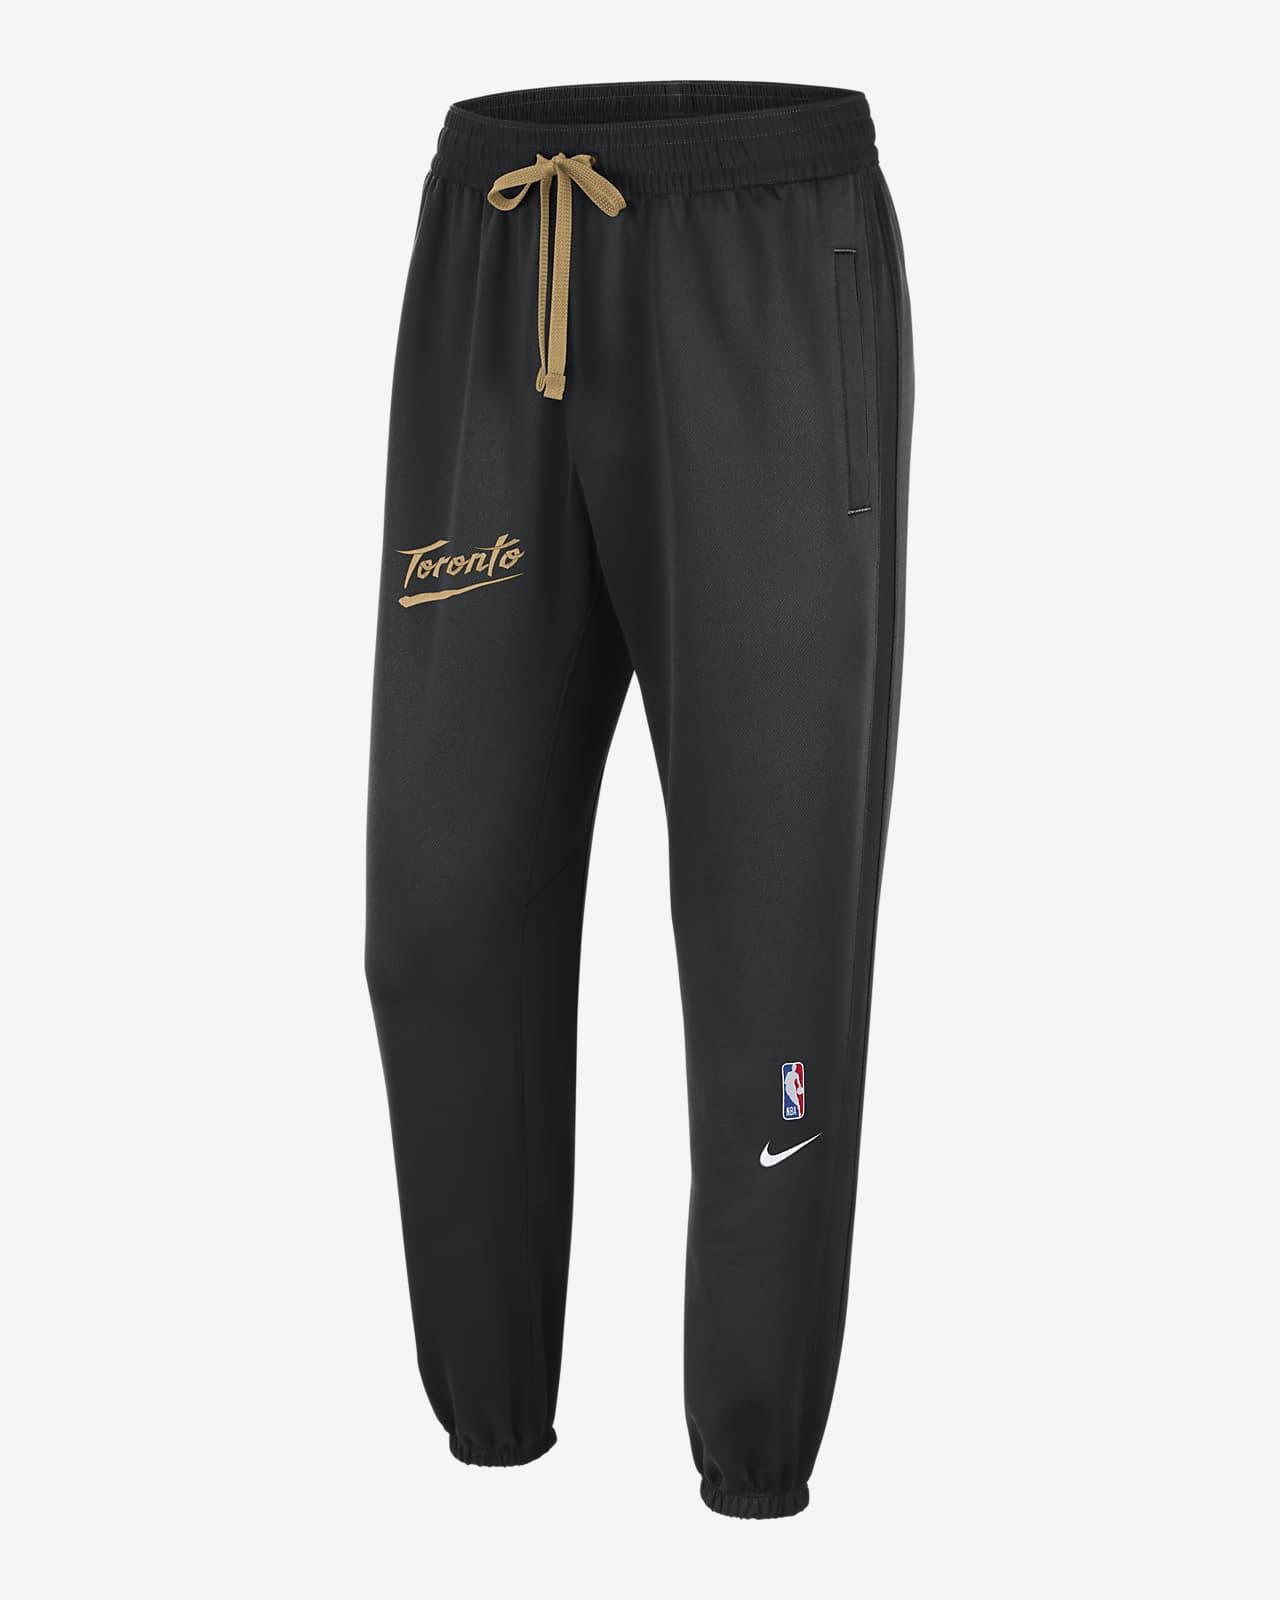 Pantalones de NBA Nike Therma Flex para hombre Toronto Raptors Showtime City Edition